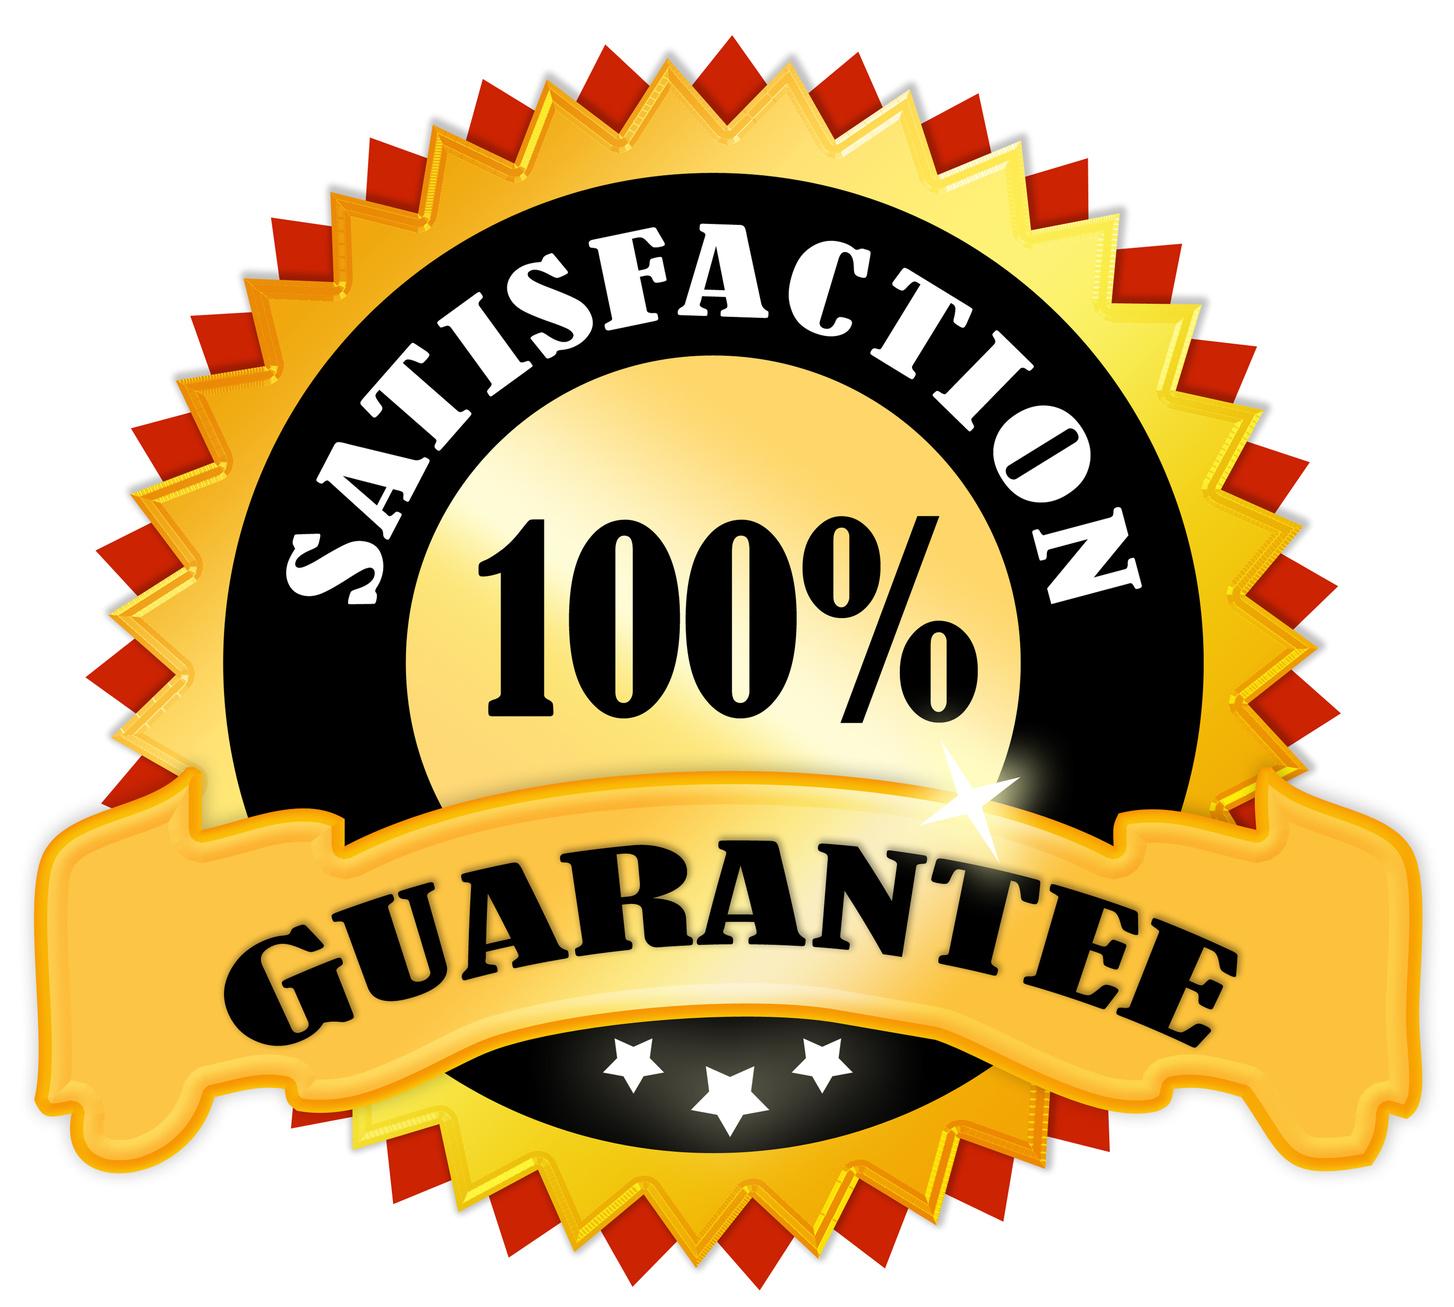 Satisfaction guaranteed logo clipart jpg black and white library Satisfaction Guarantee Icon | Landers Premier Flooring jpg black and white library